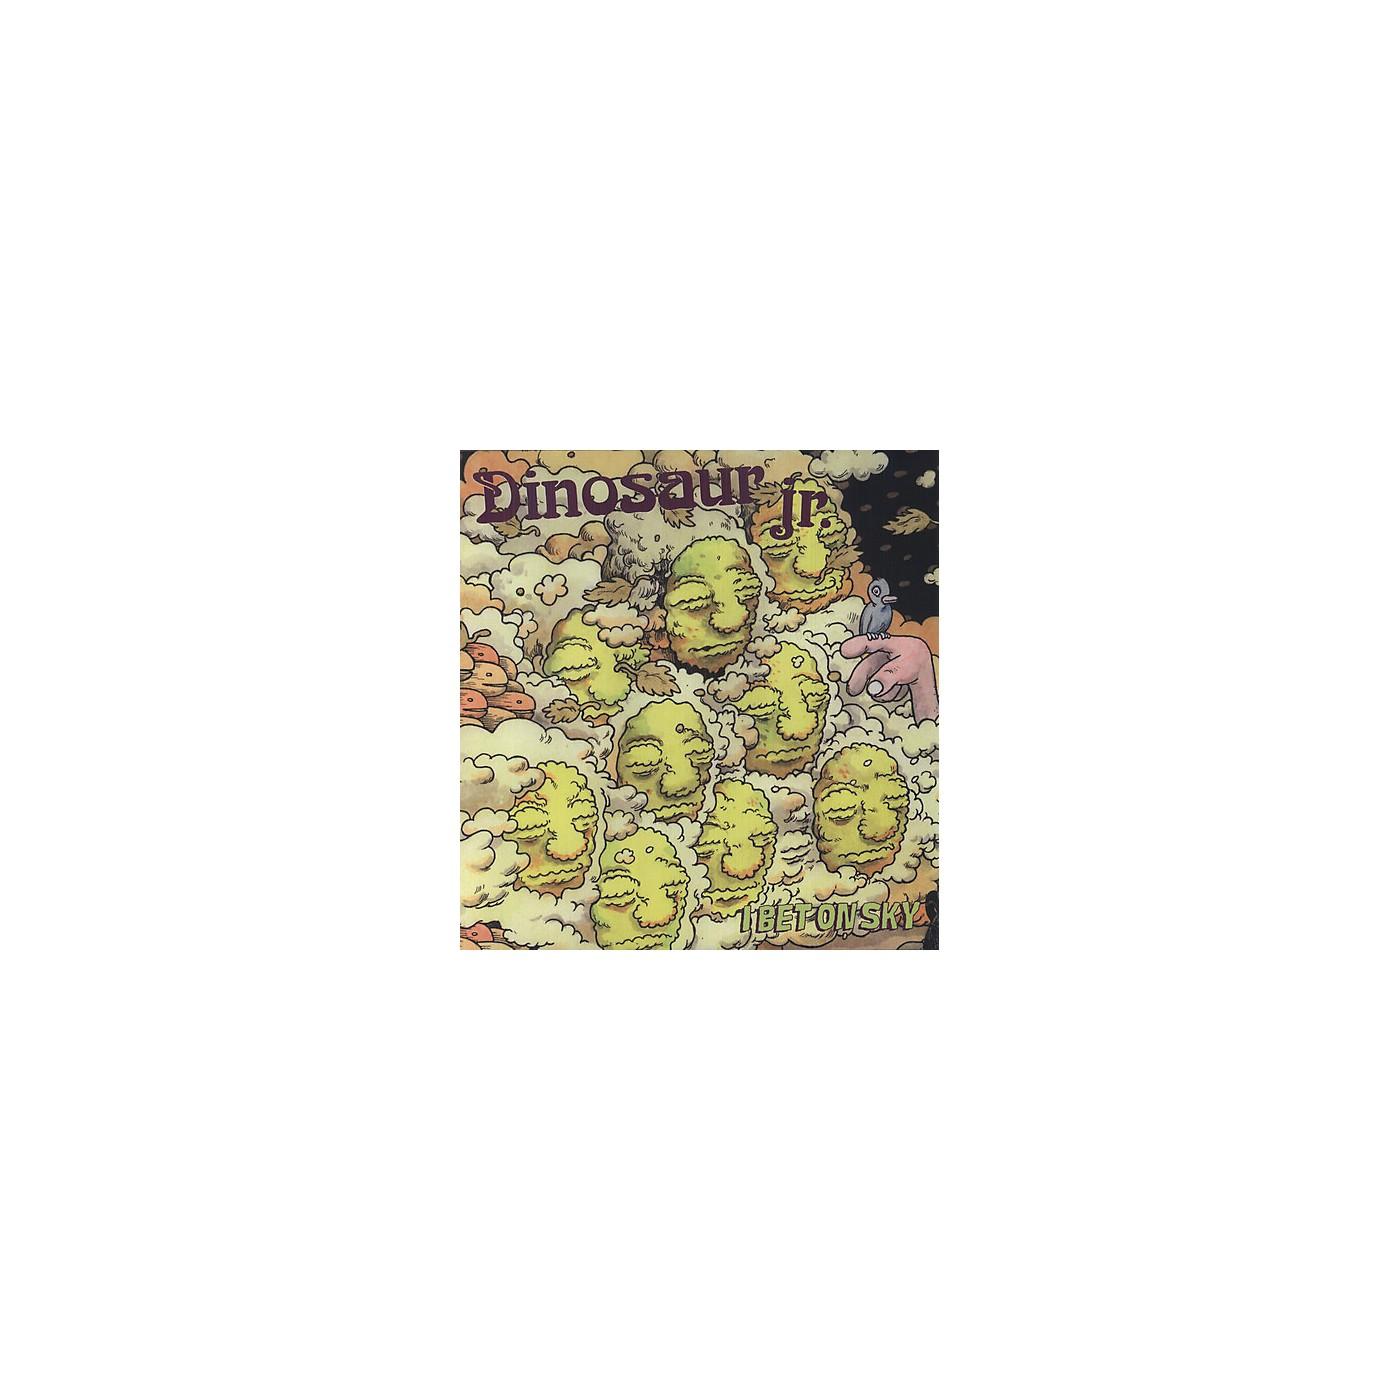 Alliance Dinosaur Jr. - I Bet on Sky thumbnail